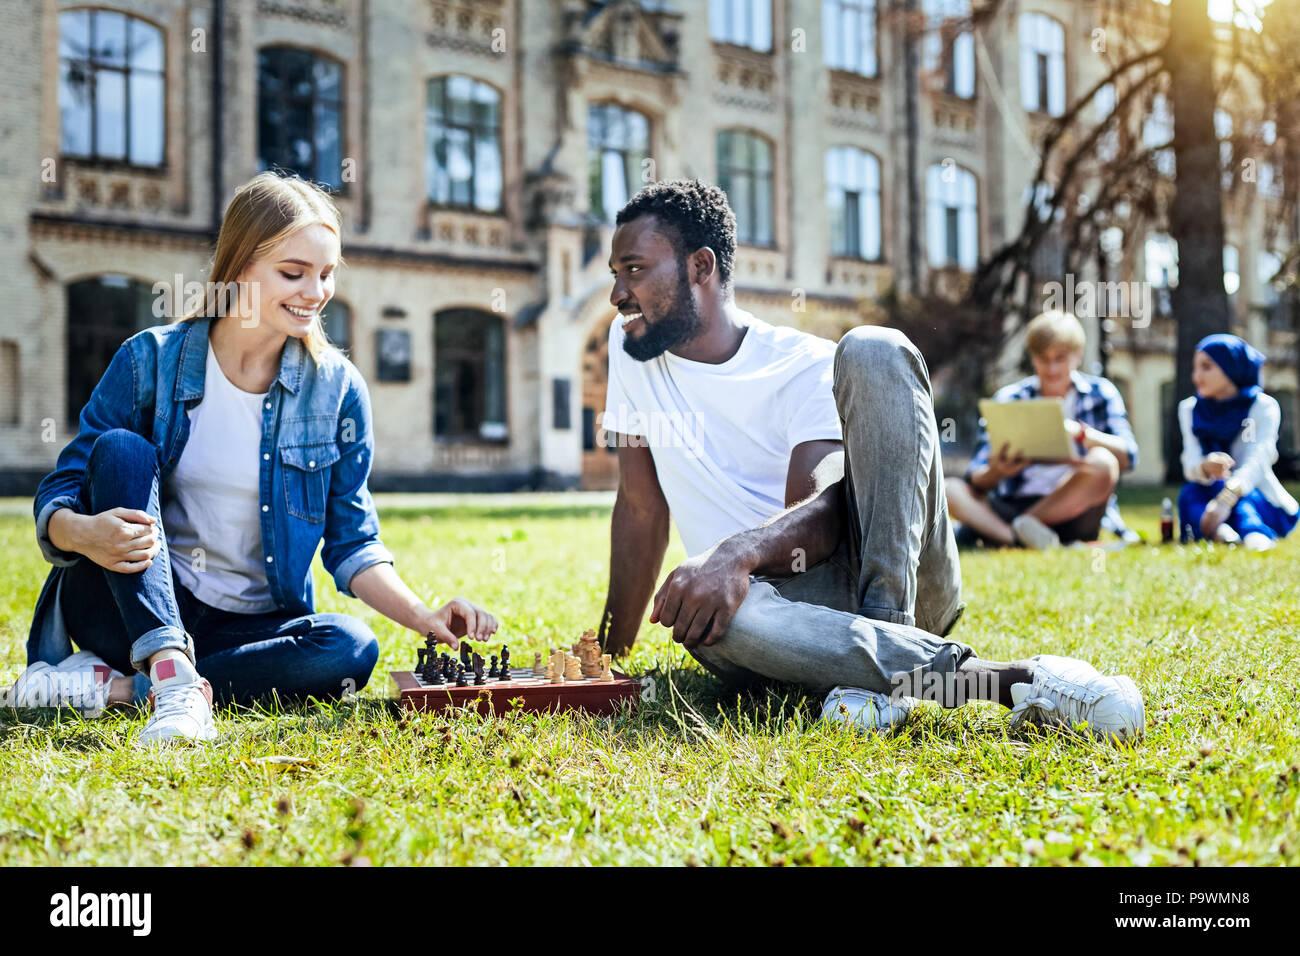 Joyeux jeunes jouant aux échecs en plein air Photo Stock